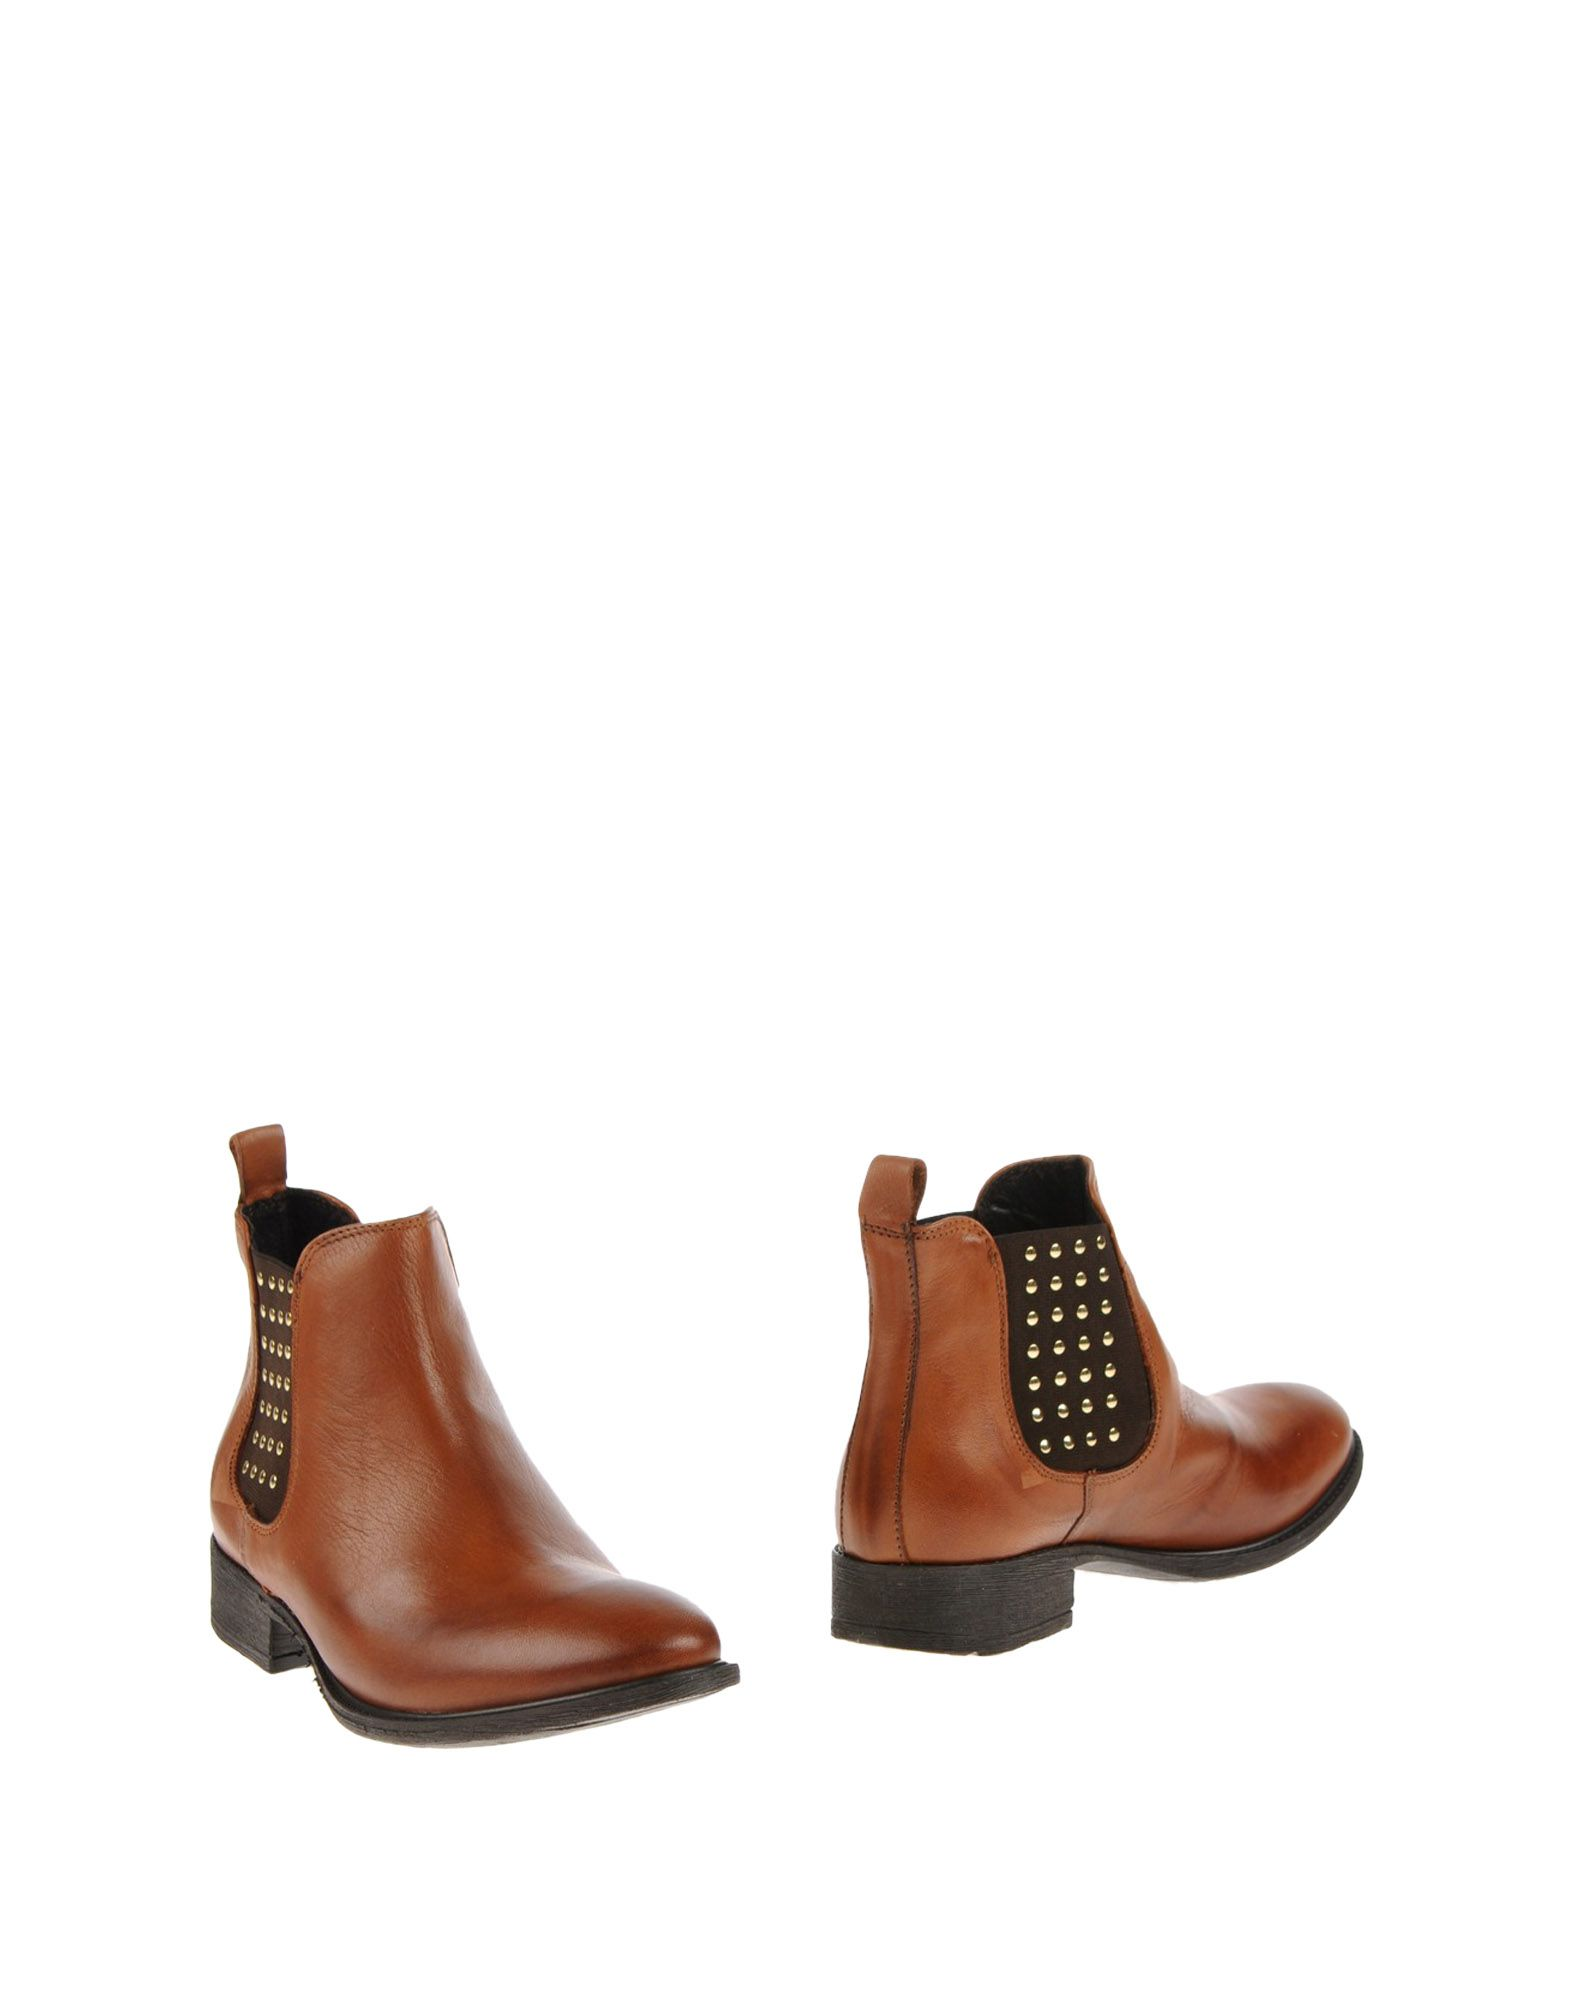 PIAMPIANI Полусапоги и высокие ботинки kudeta полусапоги и высокие ботинки